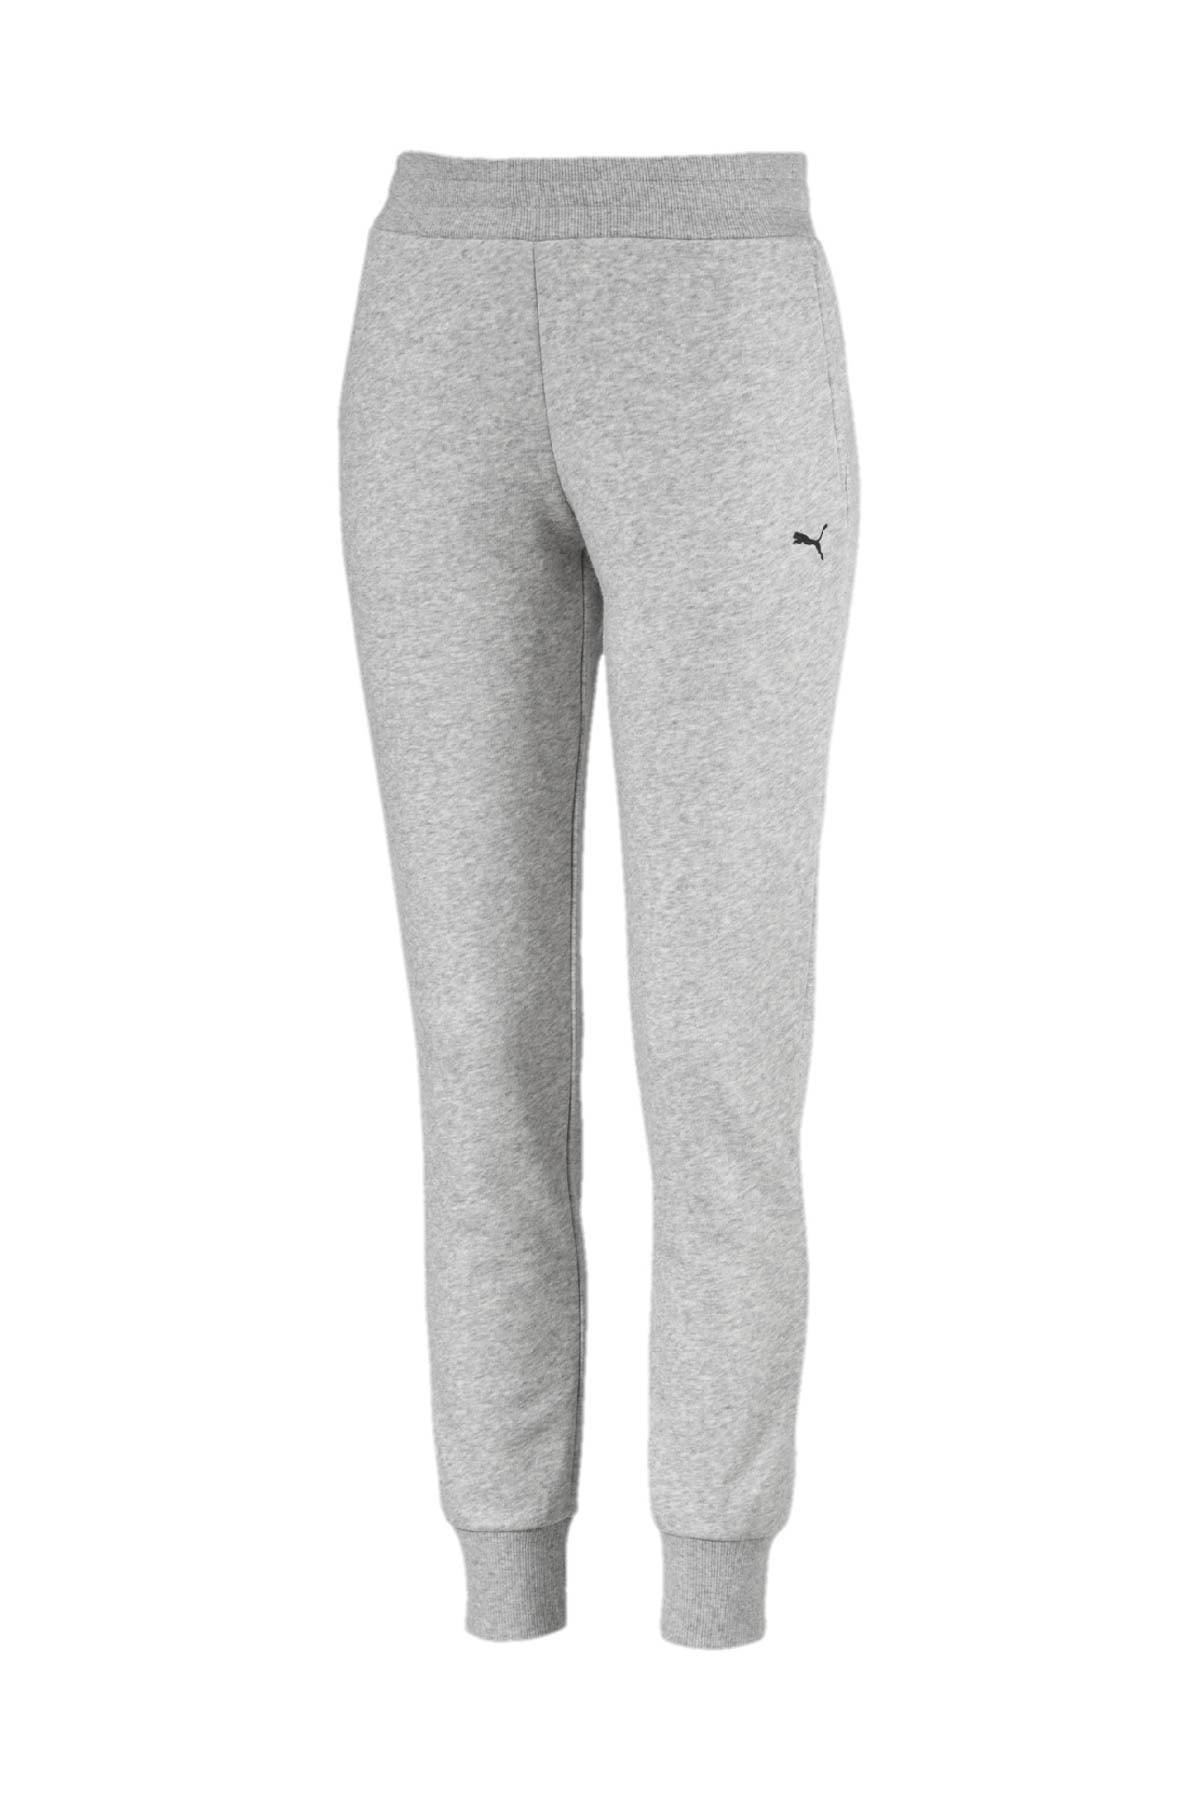 Puma Ess Sweat Pants Kadın Sweatshirt - 85182624 1